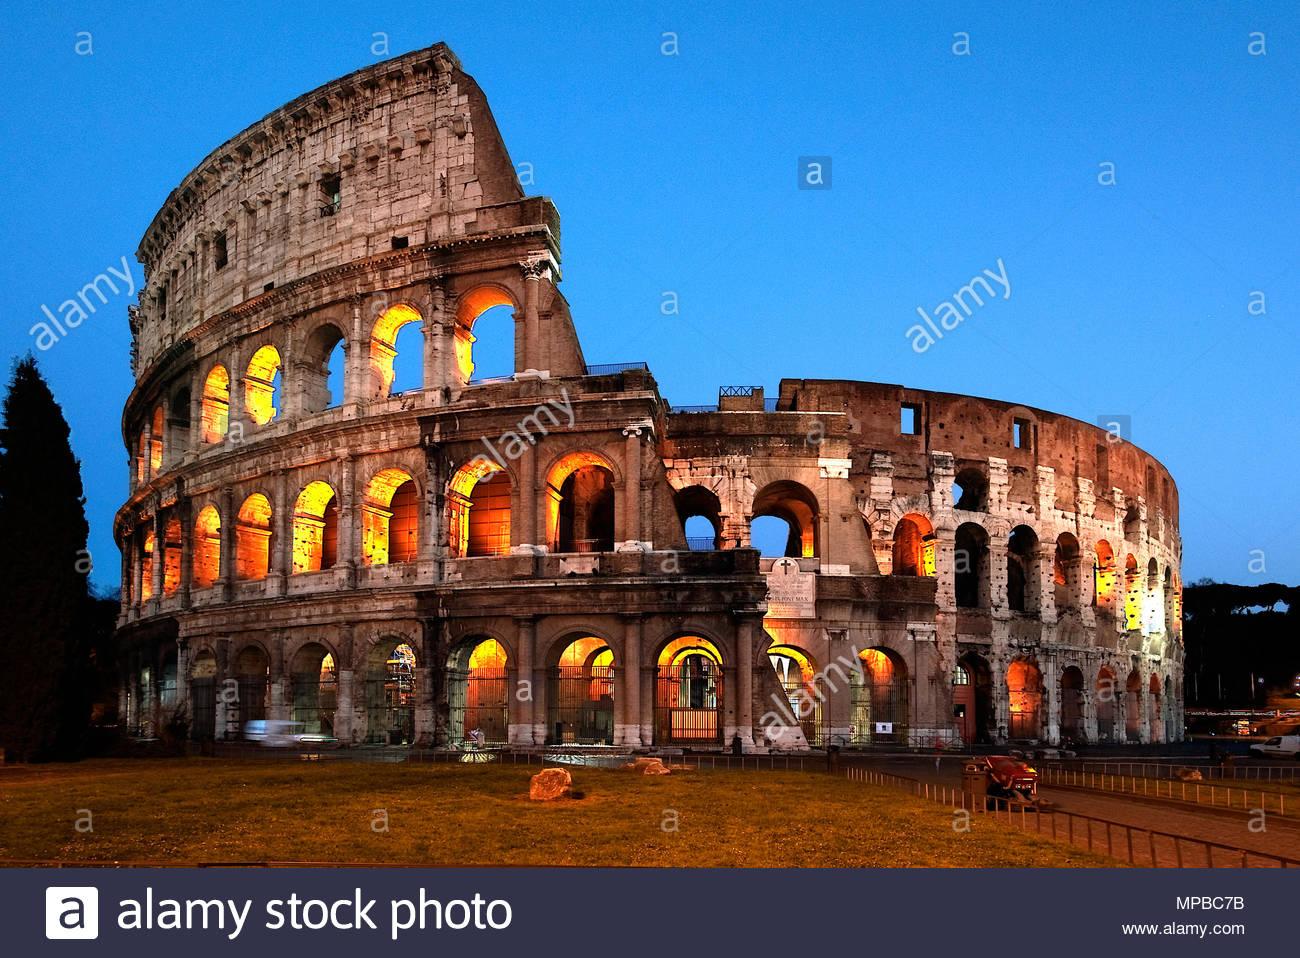 Colosseum, blue hour photography / Rome | Kolosseukm, blaue Stunde / Rom - Stock Image